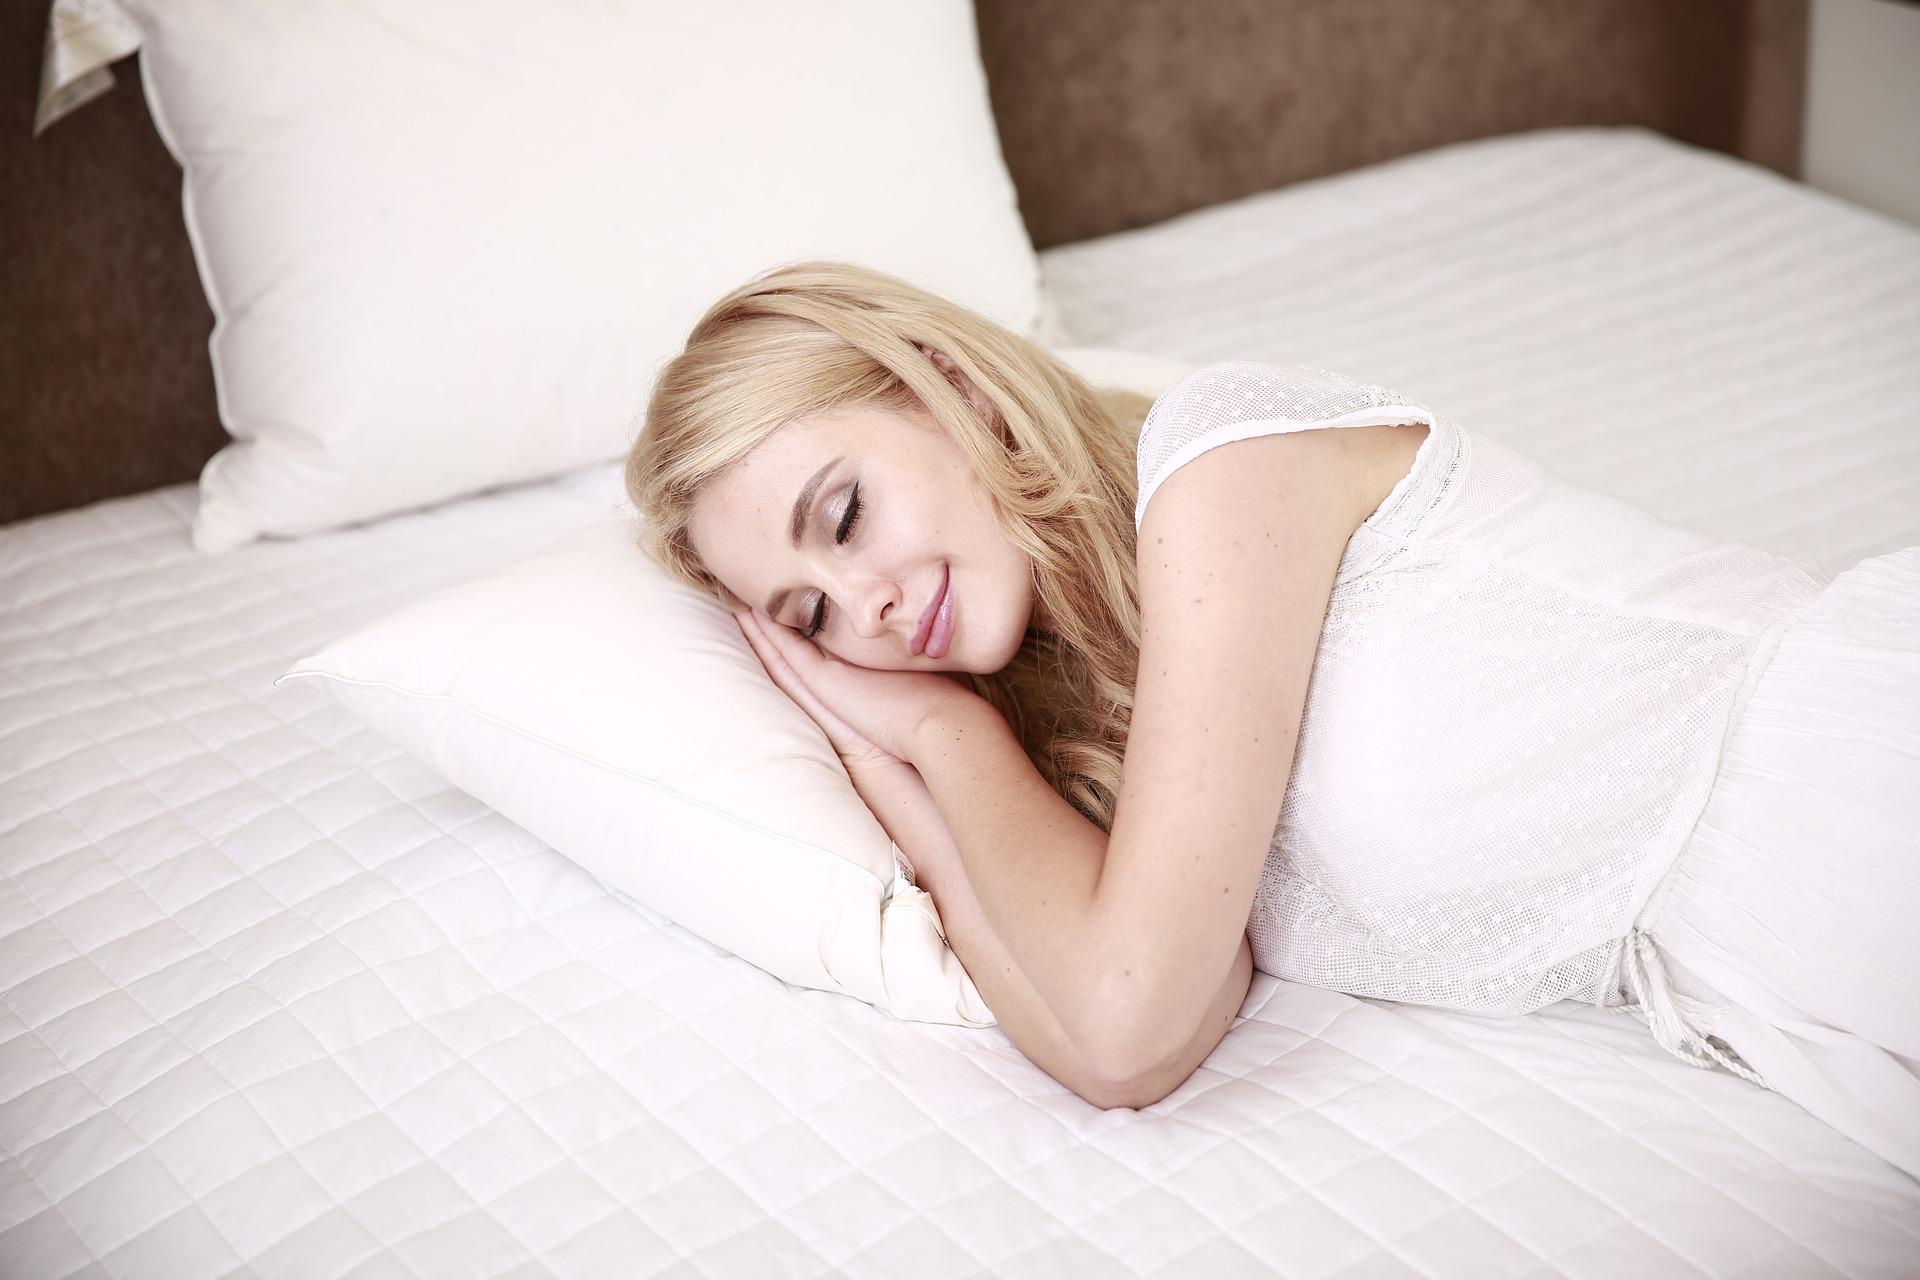 Sleep Apnea Solutions: Can a New Mattress Solve Sleep Apnea?